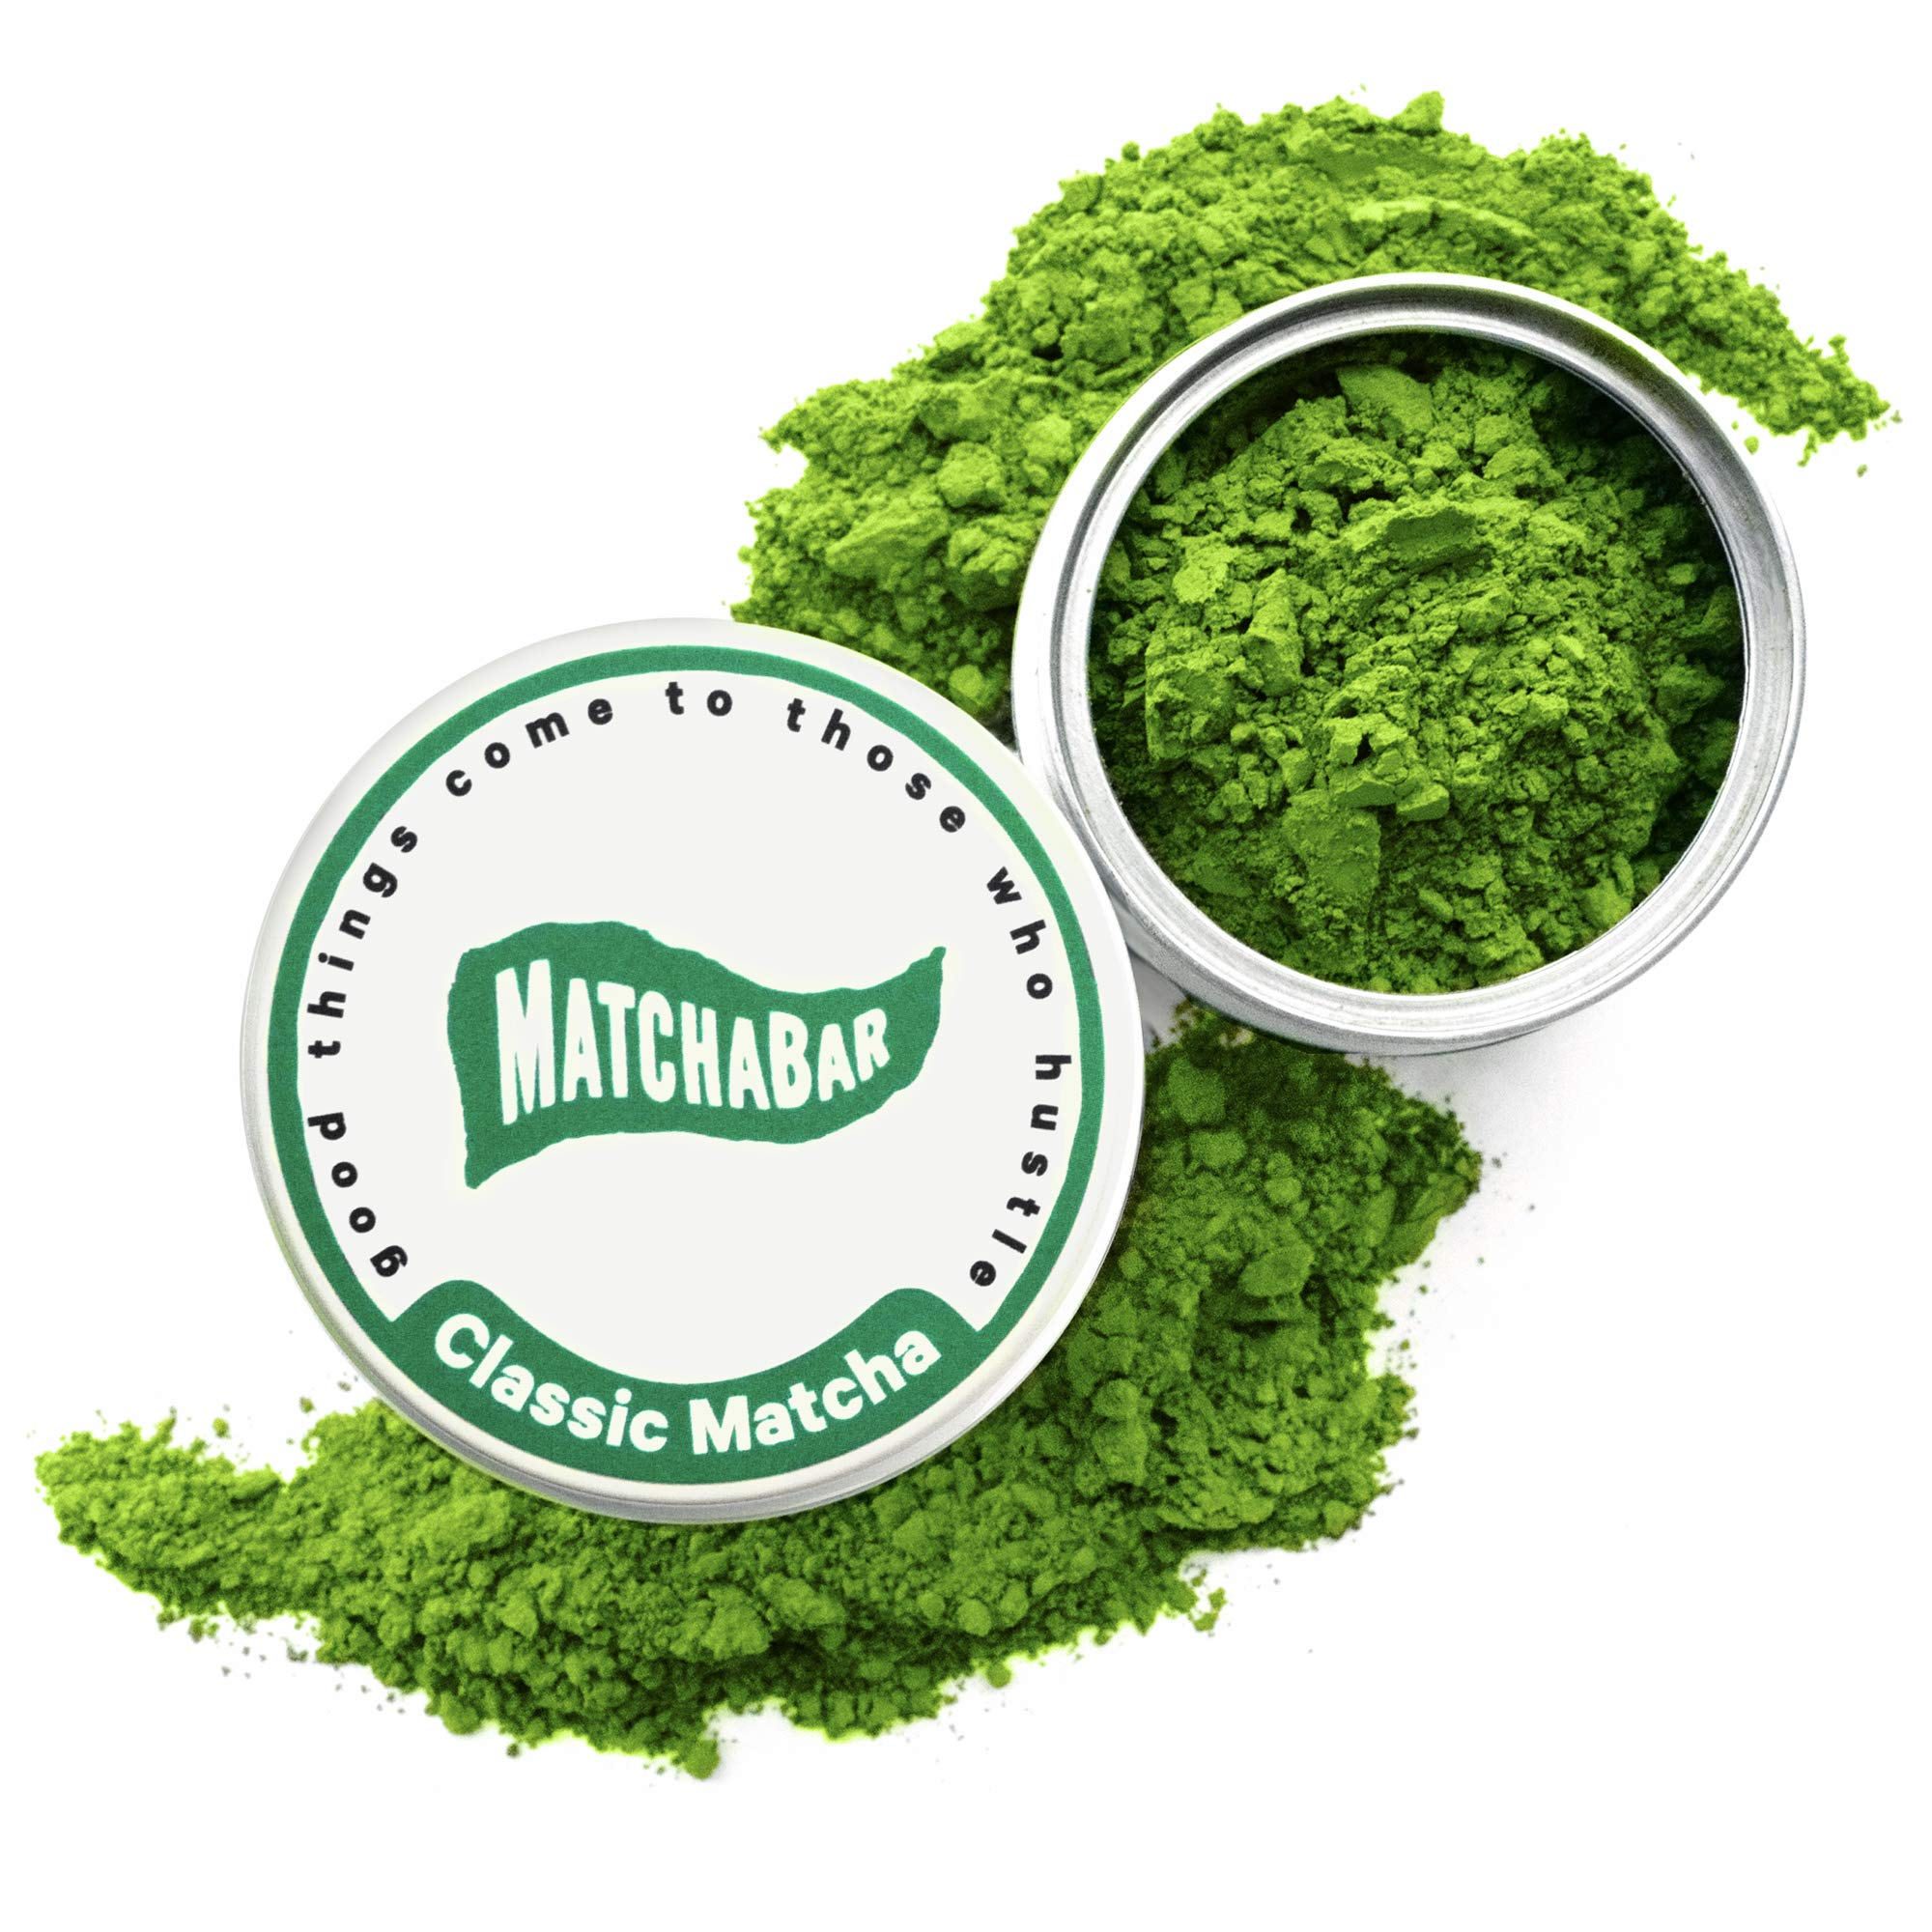 Matchabar Ceremonial Grade Matcha Green Tea Powder (80g) by MATCHABAR